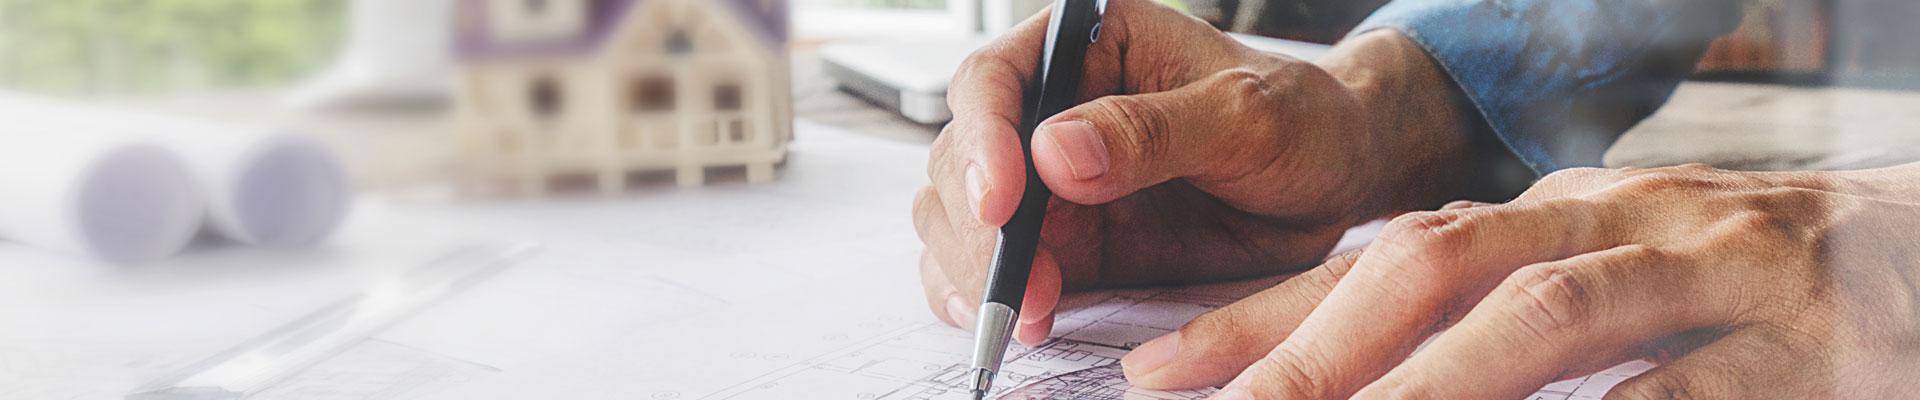 https://abharchitecture.com/wp-content/uploads/2020/06/architects-blueprint.jpg